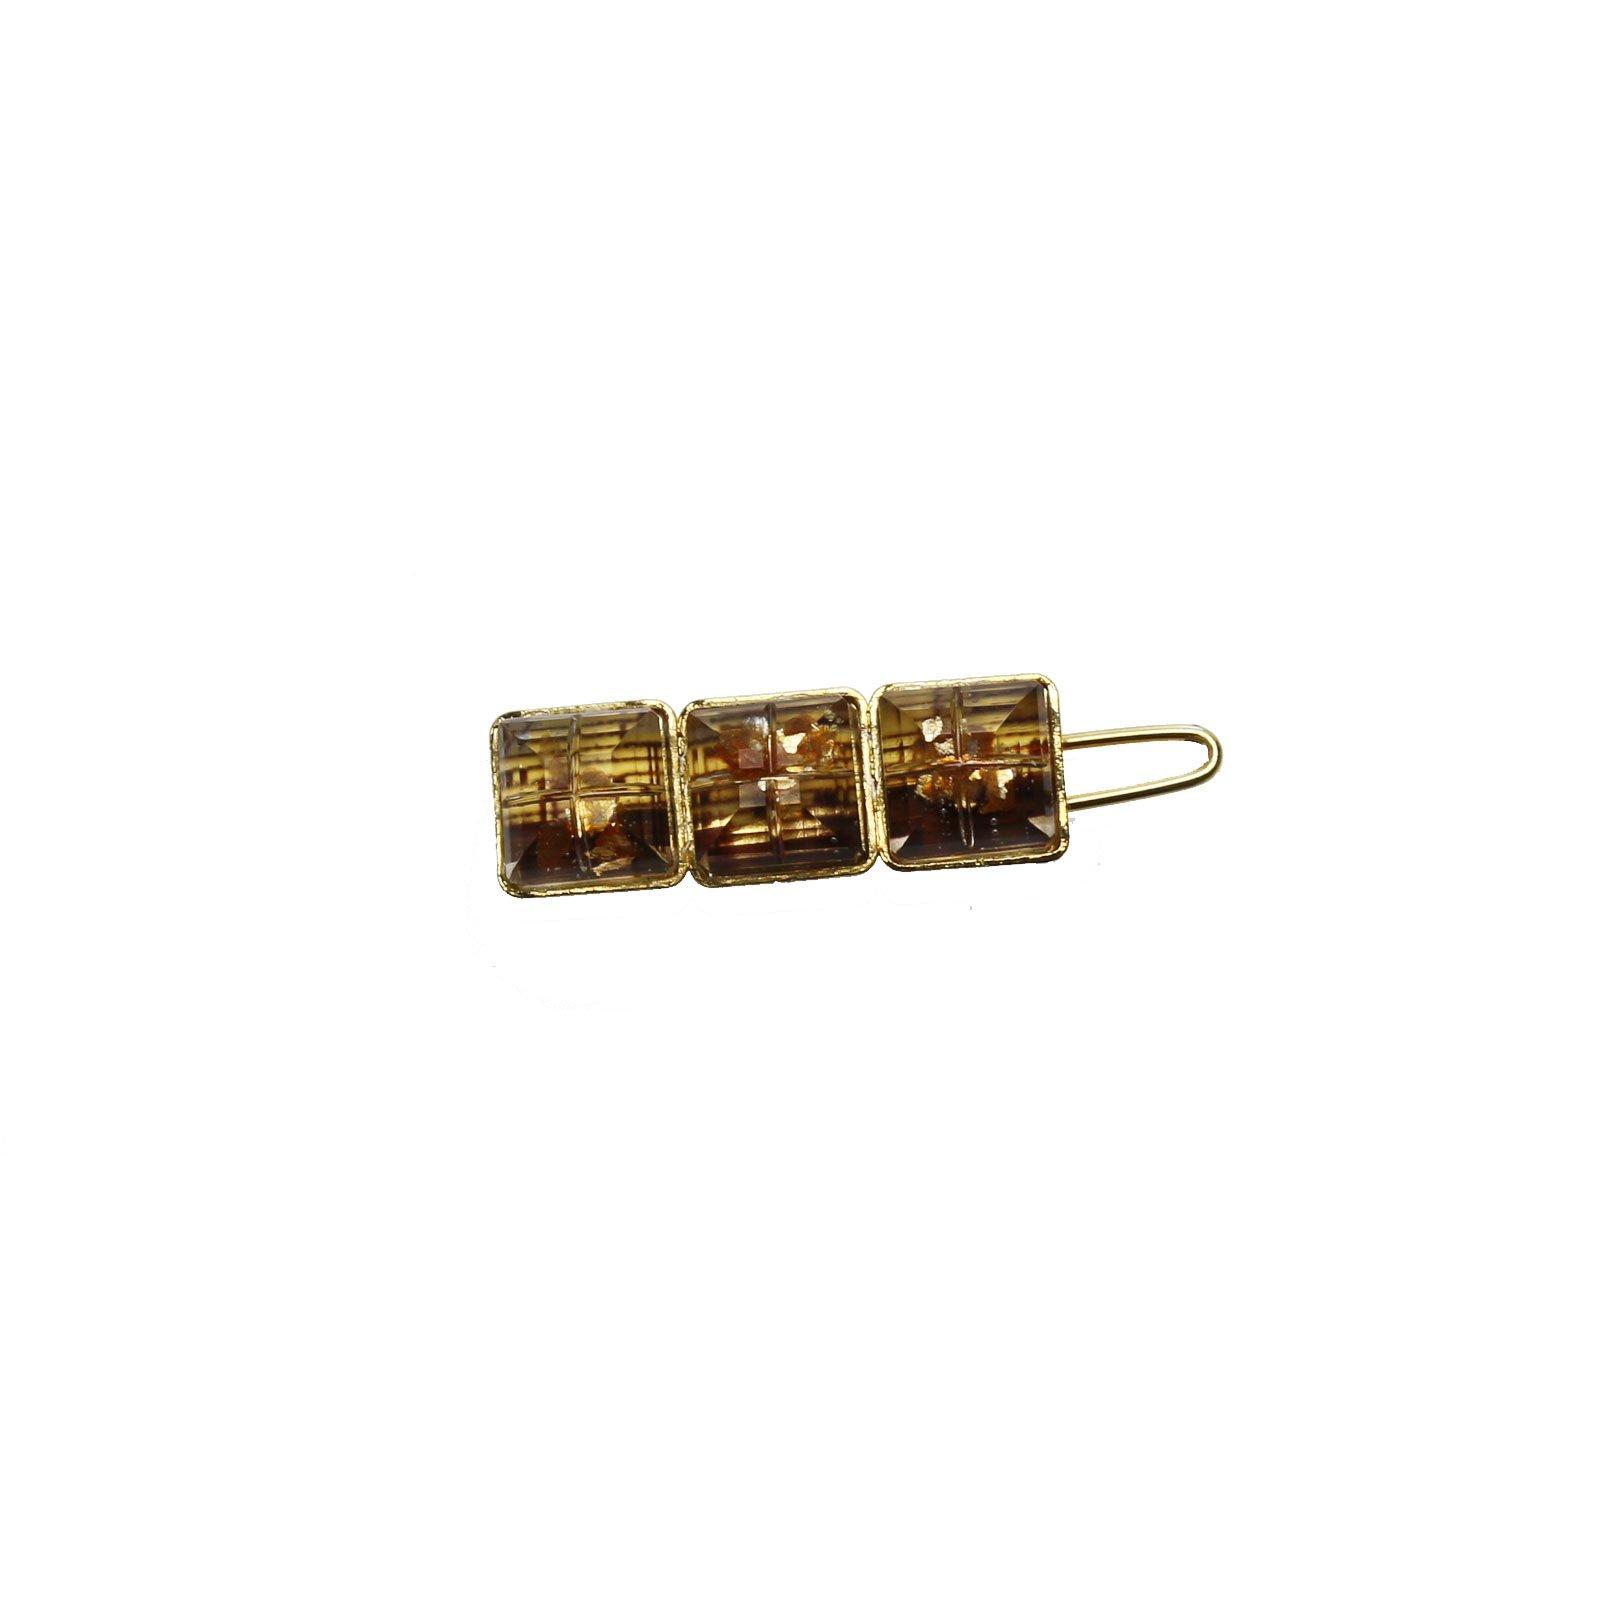 Tamarusan Hairpin Clip Hair Pinned Golden Yellow Gold Clip Unisex